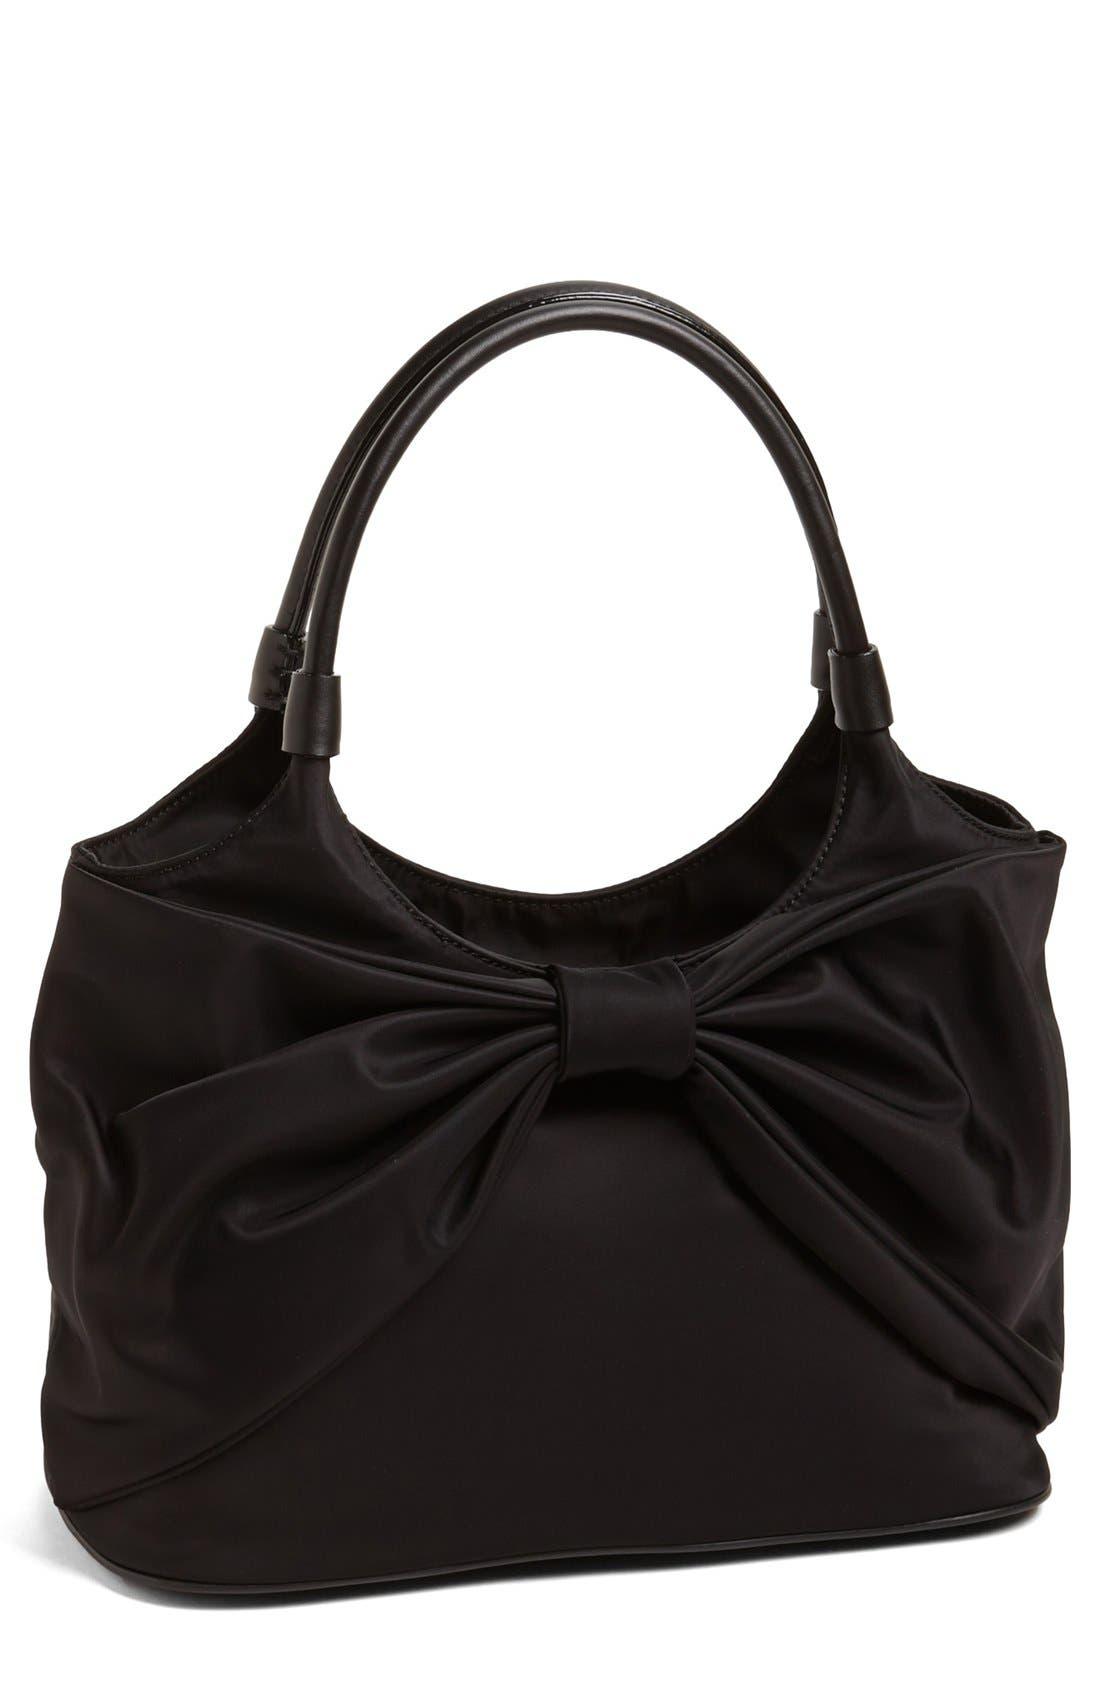 Main Image - kate spade new york 'sutton' shoulder bag